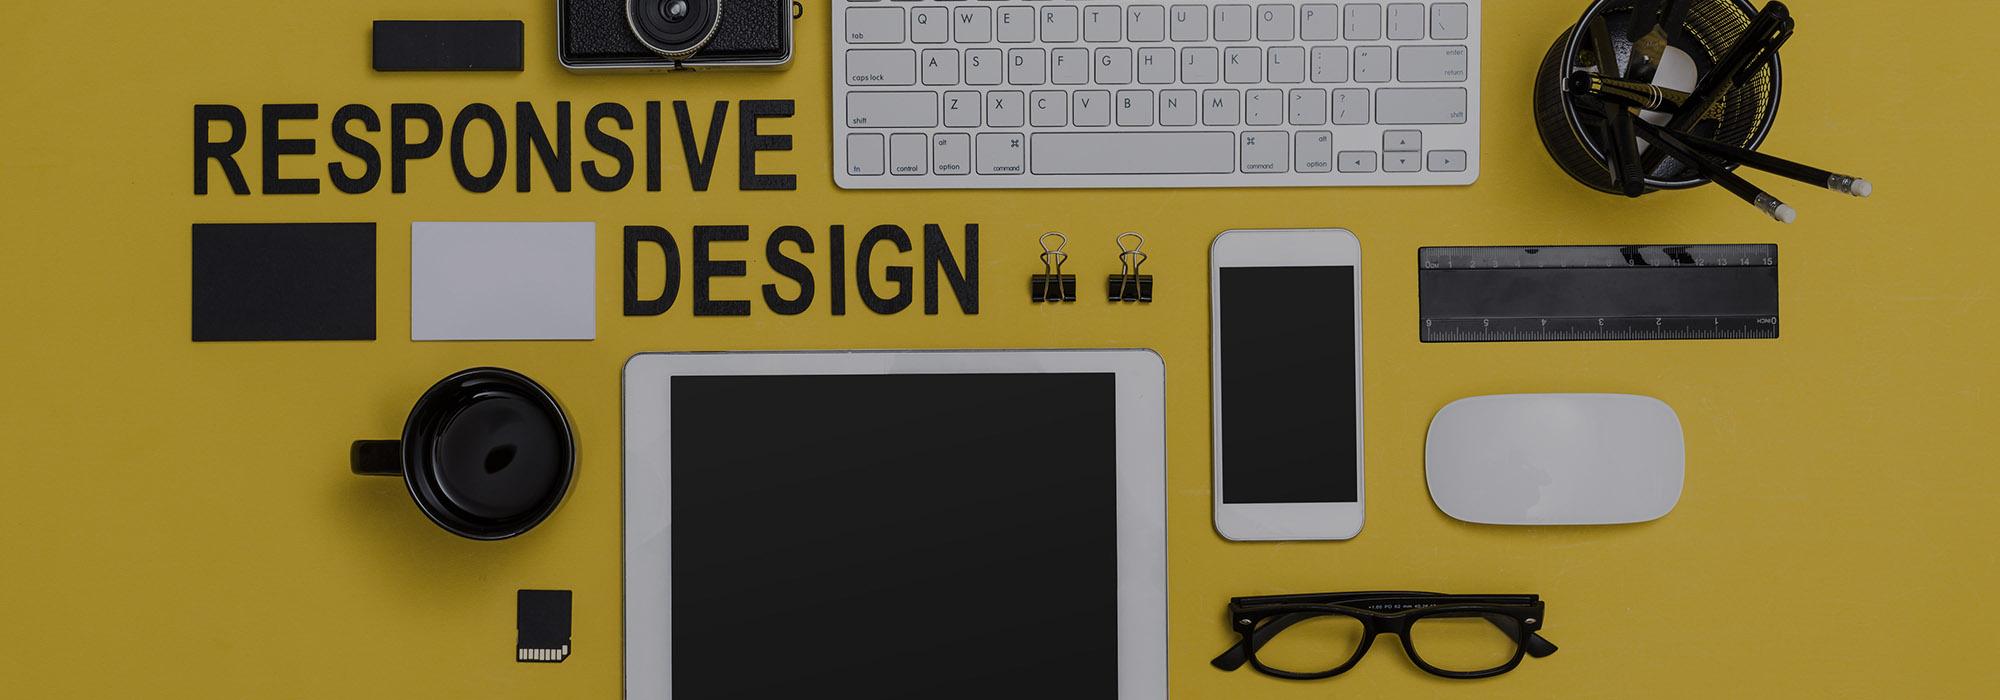 Adaptive Design or Responsive Design?